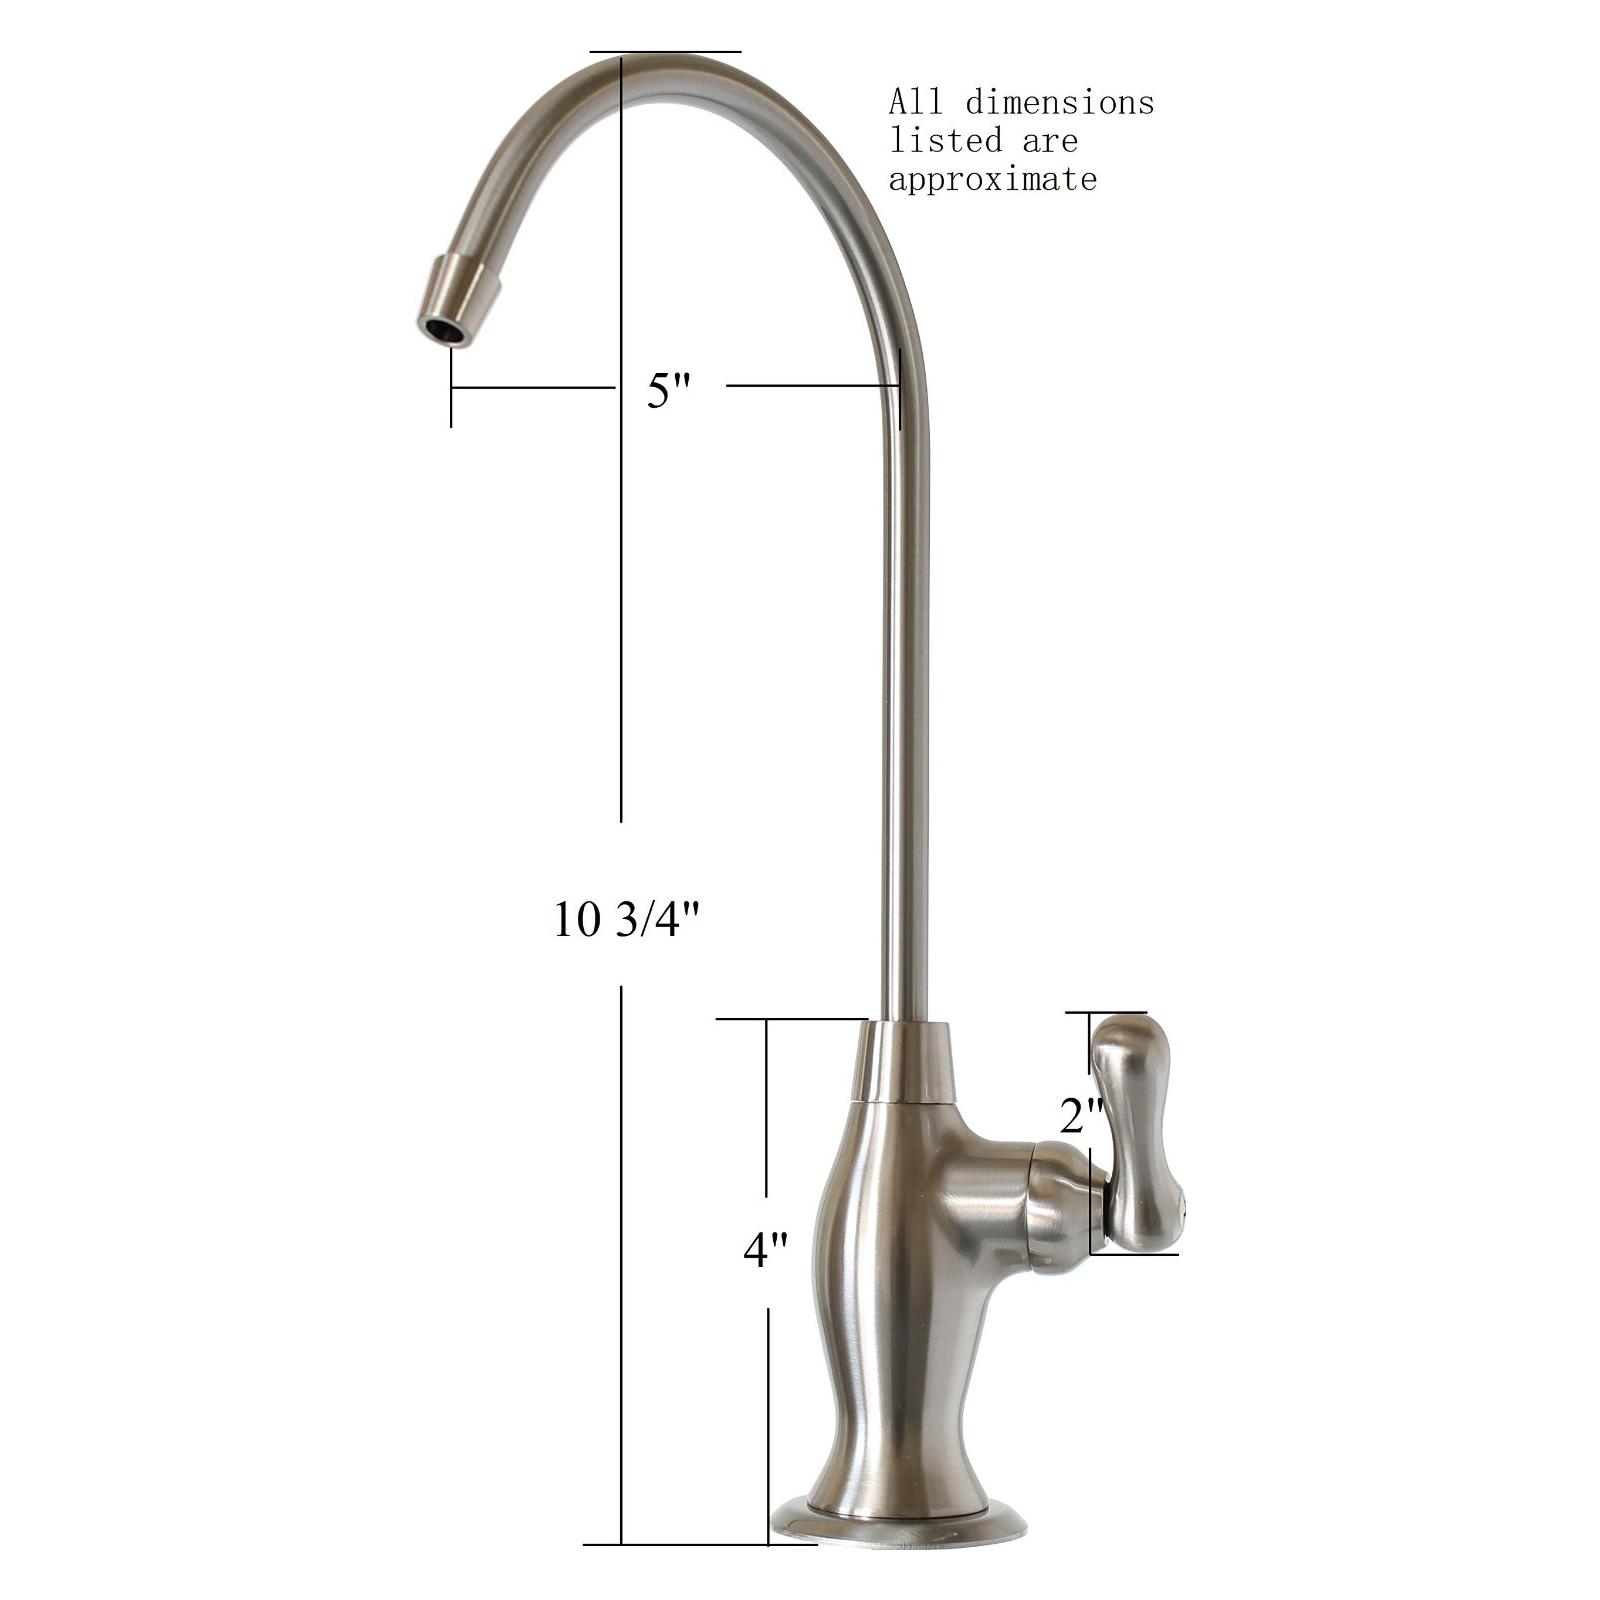 Metpure Reverse Osmosis Faucet (Brushed Nickel)